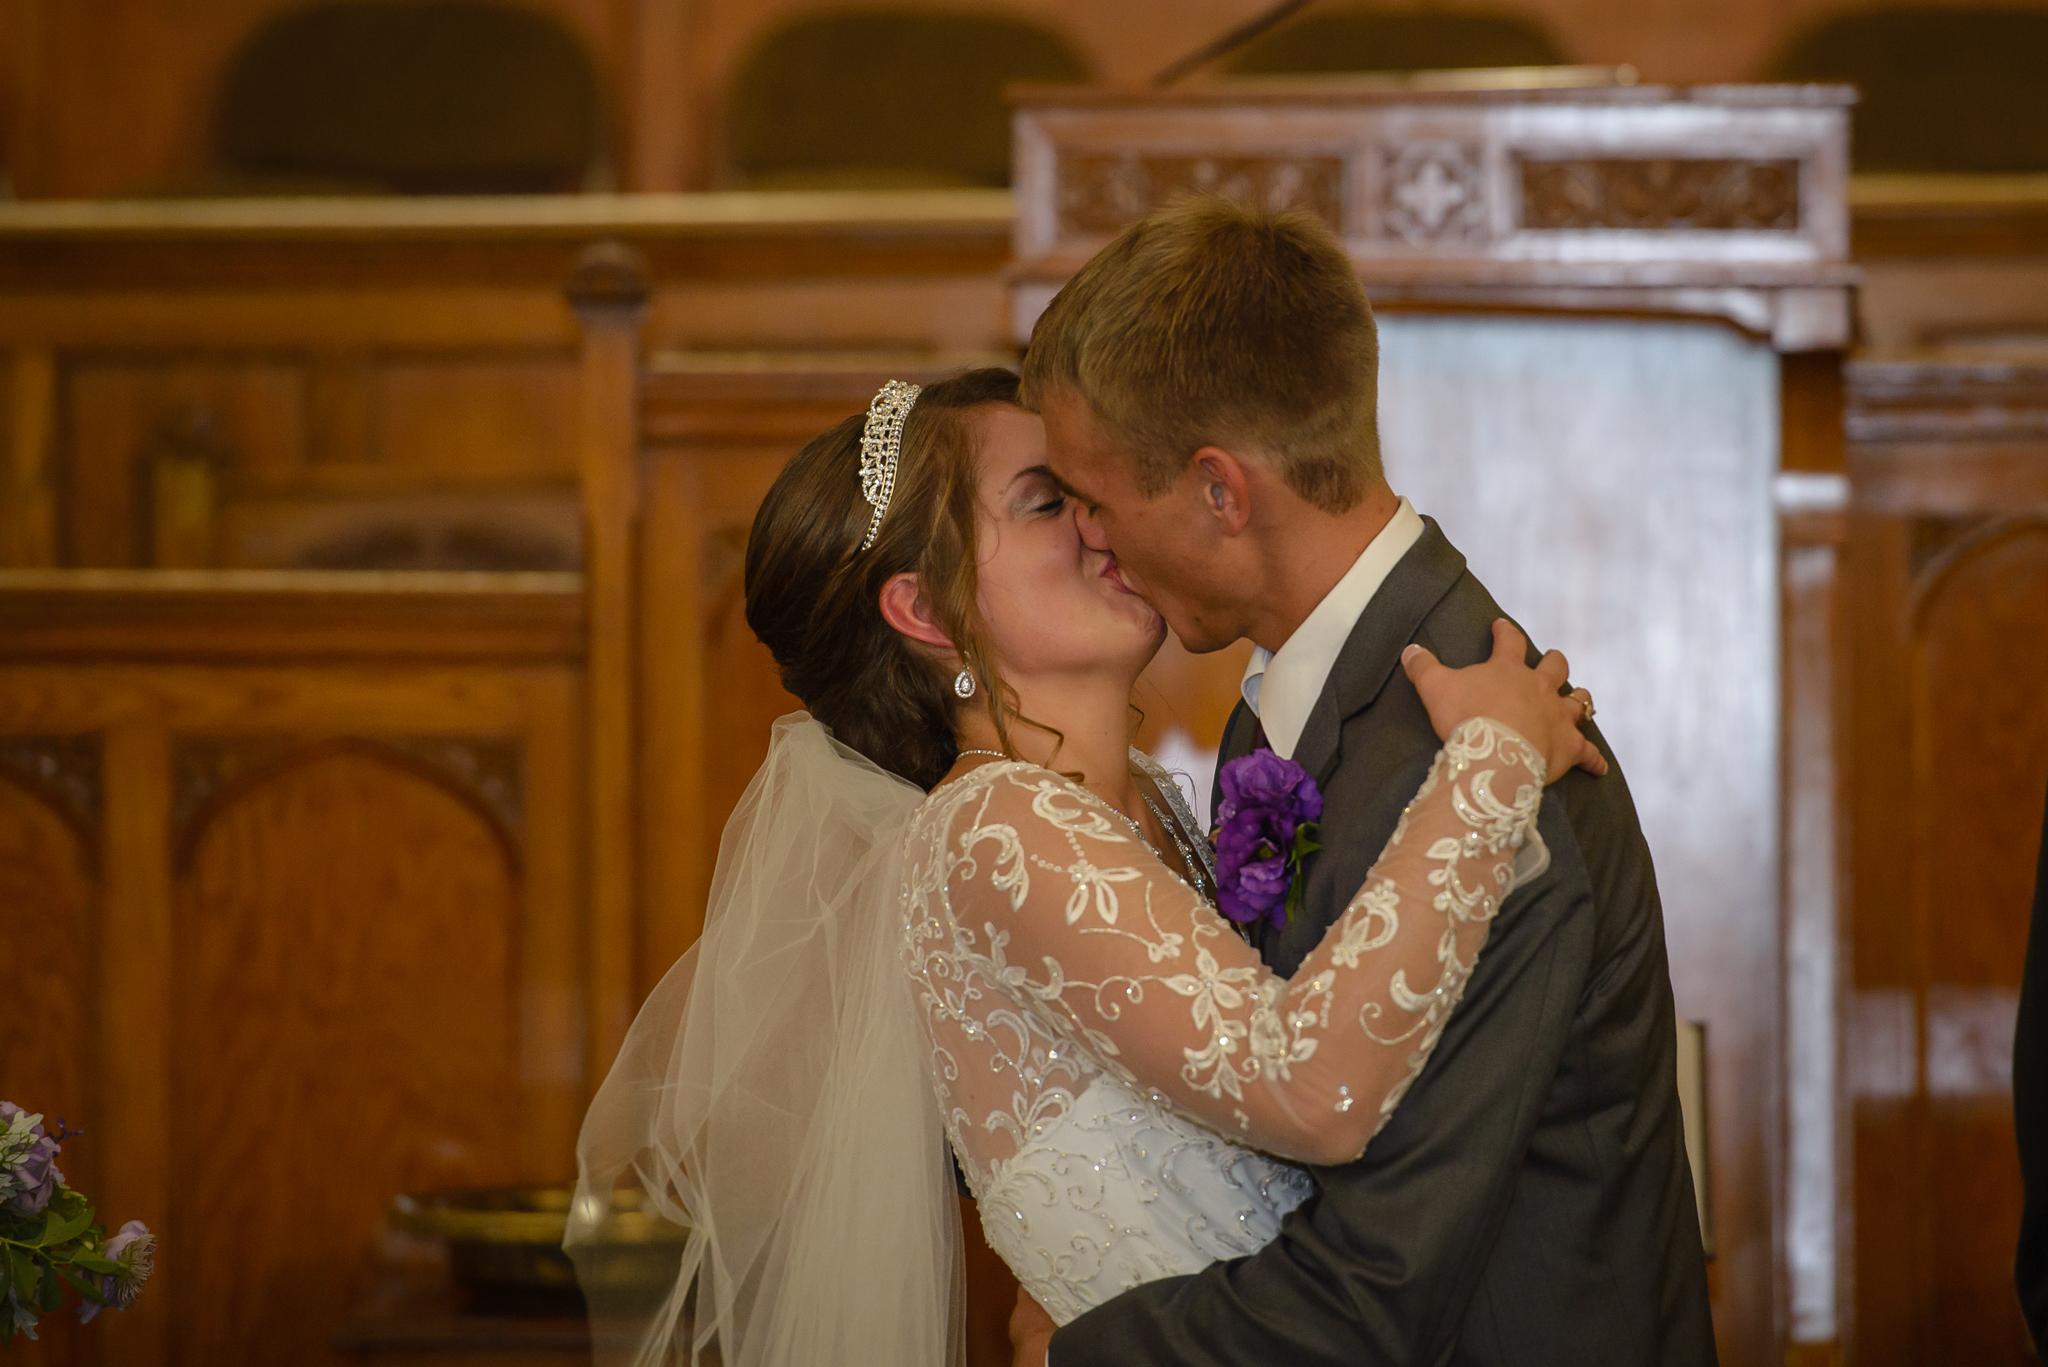 16-ashland washburn wedding photographyDSC_3726.jpg